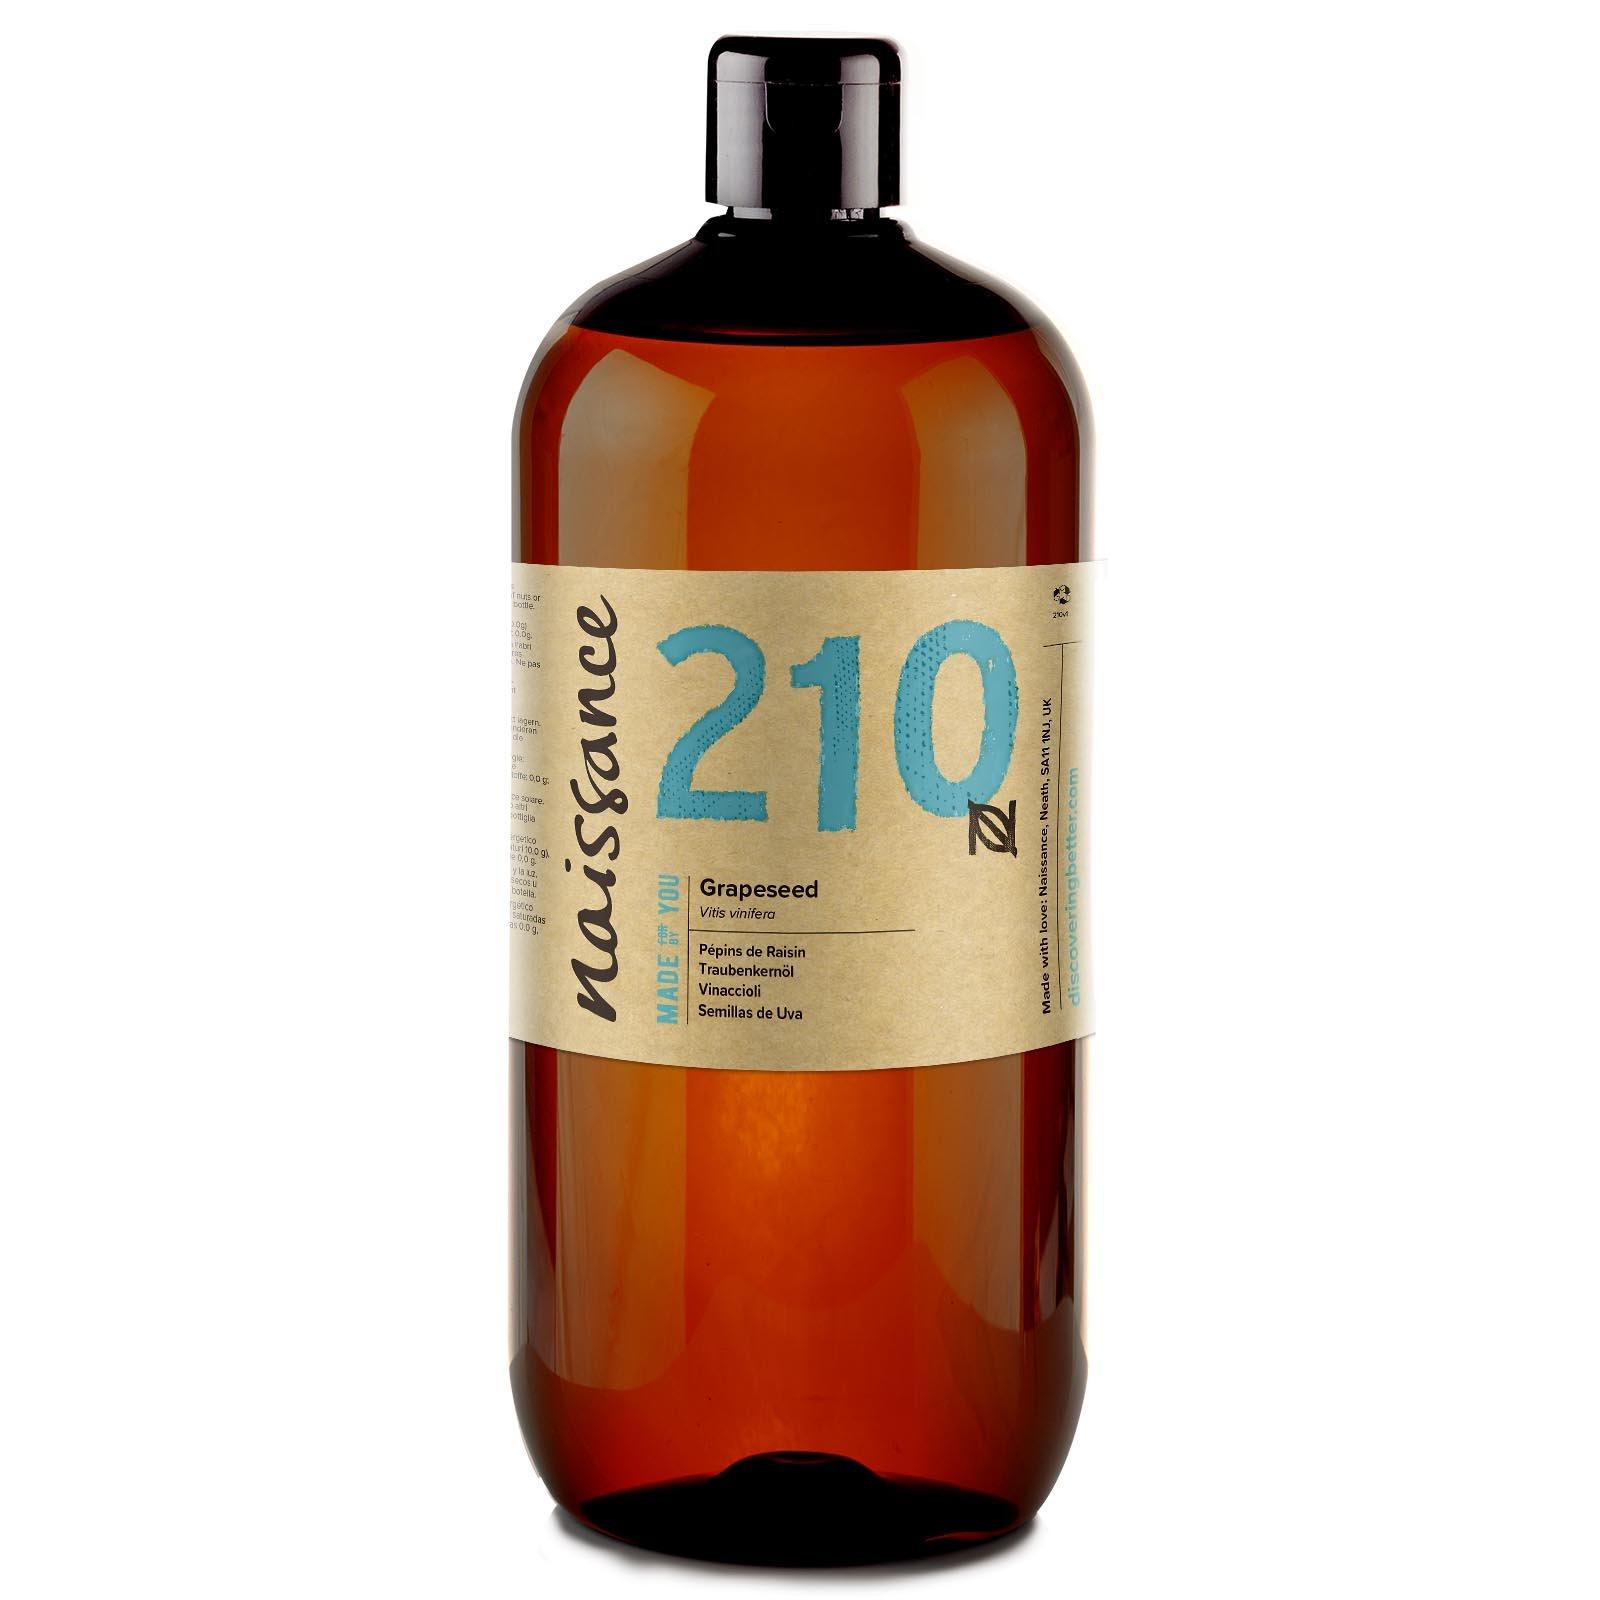 Naissance Aceite Vegetal de Semillas de Uva n. º 210 – 1 Litro - Puro